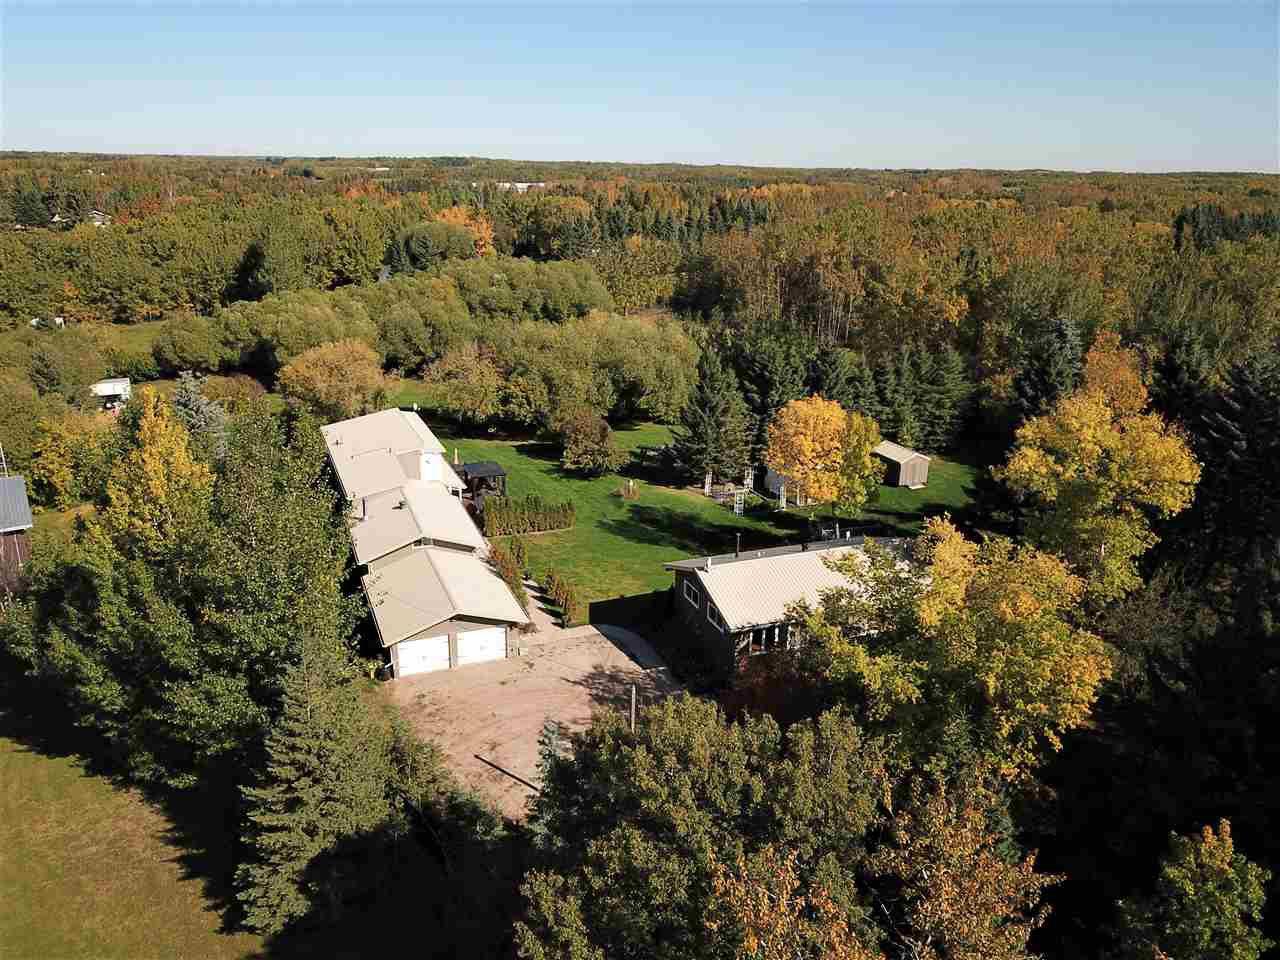 Main Photo: 1000 Bauer Avenue: Rural Parkland County House for sale : MLS®# E4171765